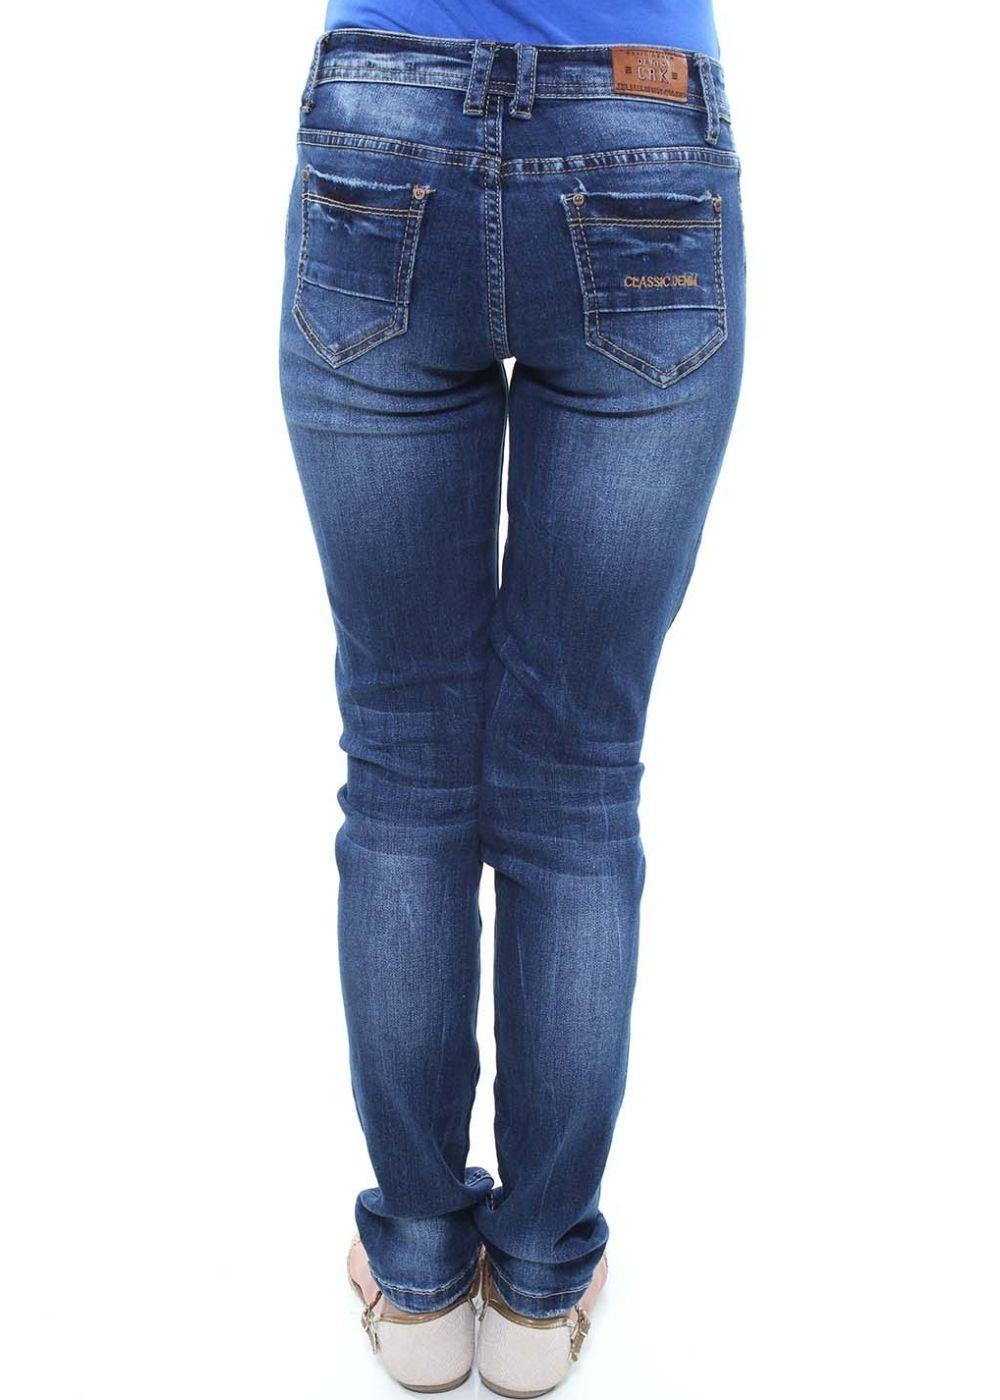 Calça Jeans Skinny Juvenil Feminina Crocker - 45925  - CROCKER JEANS